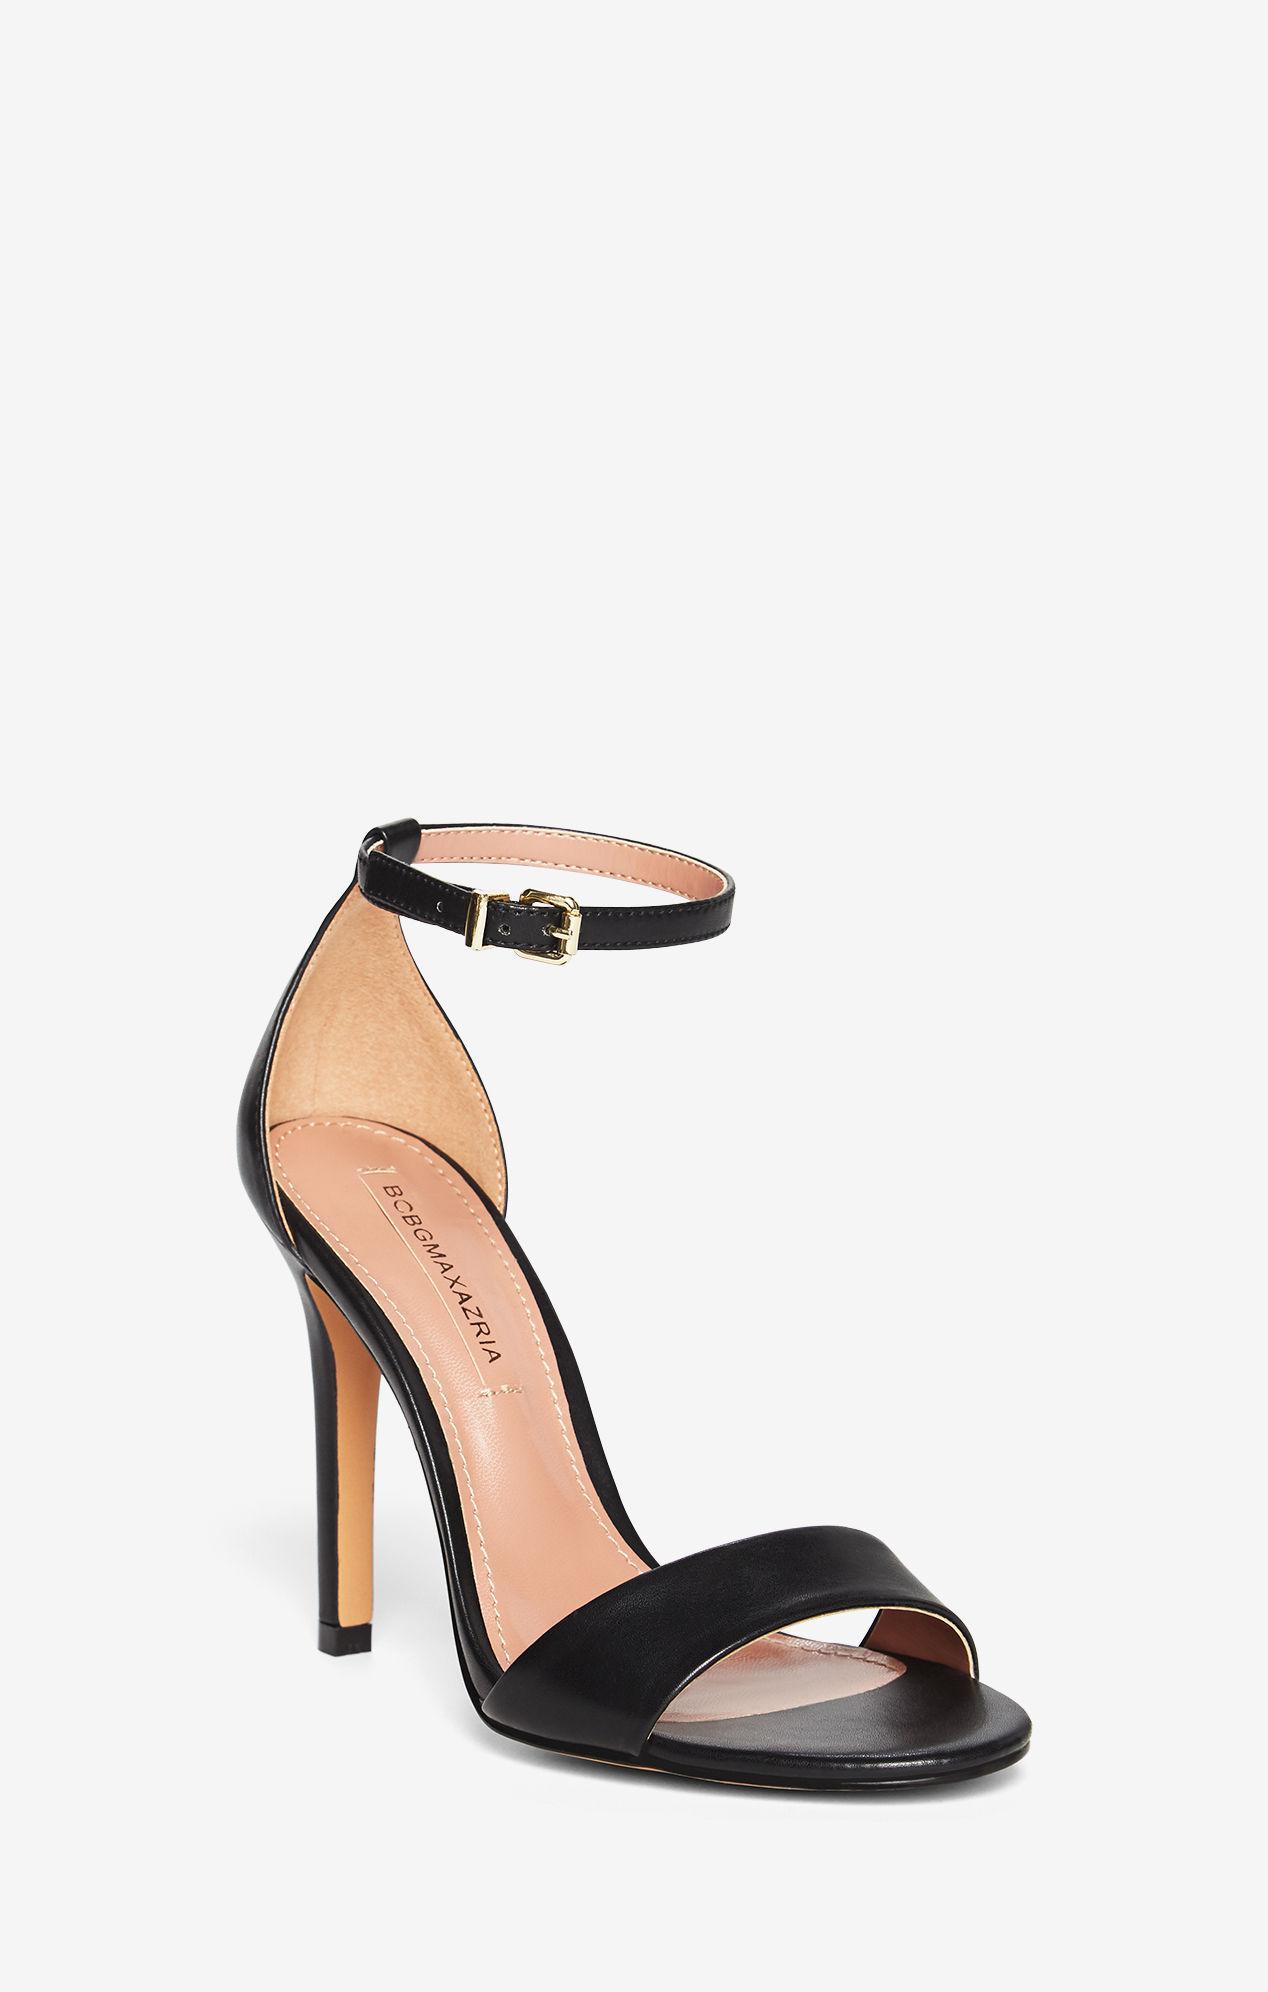 5669338e83fa BCBGMAXAZRIA Bcbg Ellettra Faux-leather Sandal in Black - Lyst